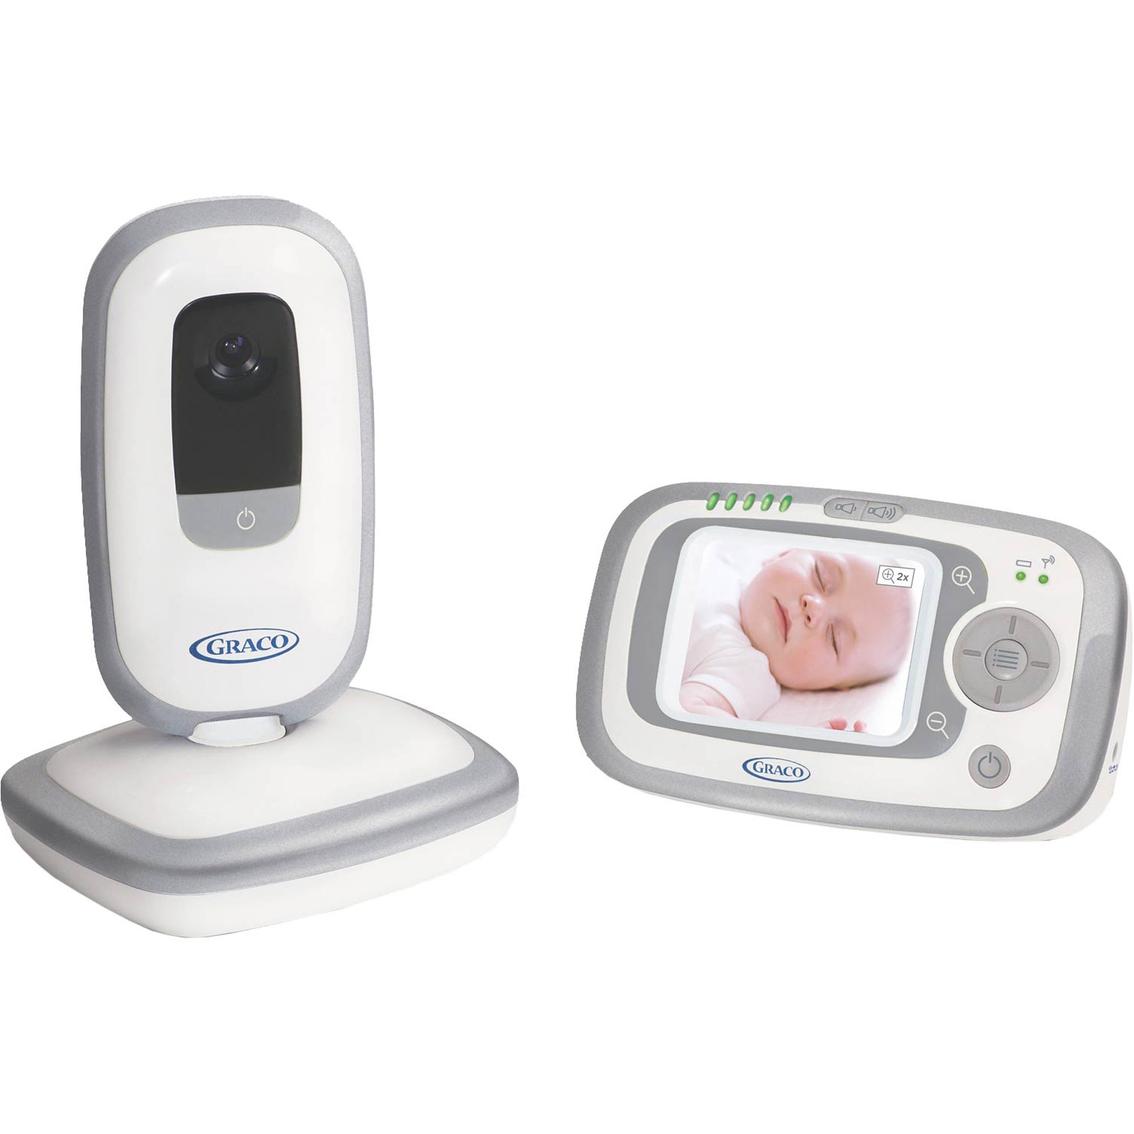 graco true focus digital video baby monitor baby monitors baby toys. Black Bedroom Furniture Sets. Home Design Ideas